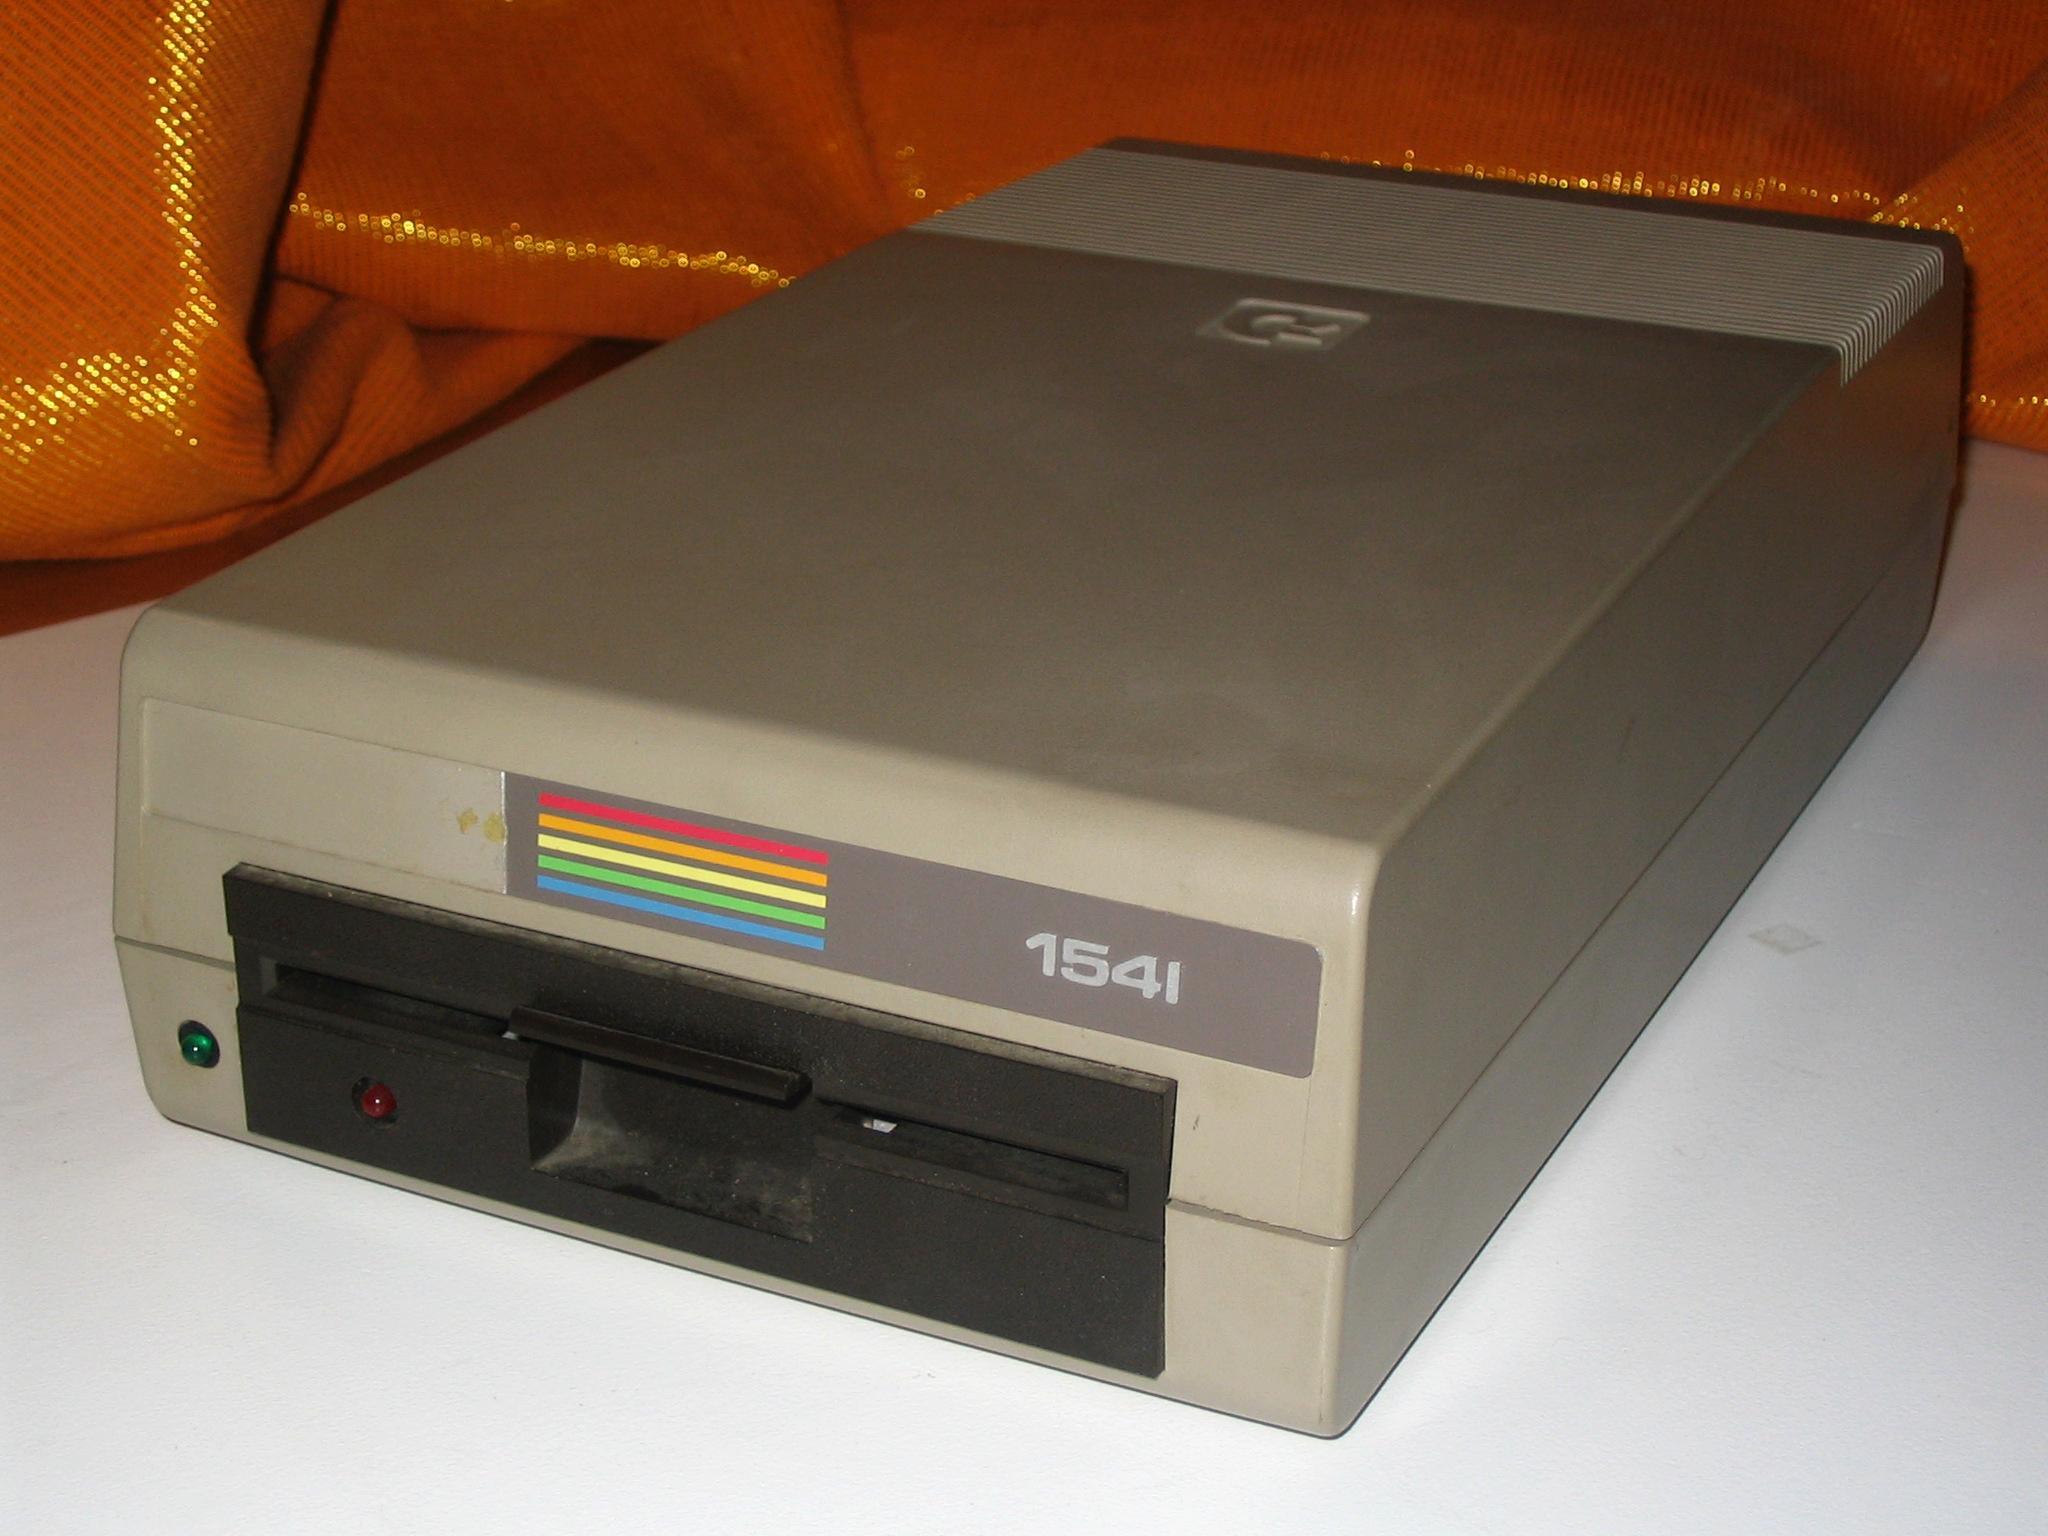 File:C64 1541.jpg